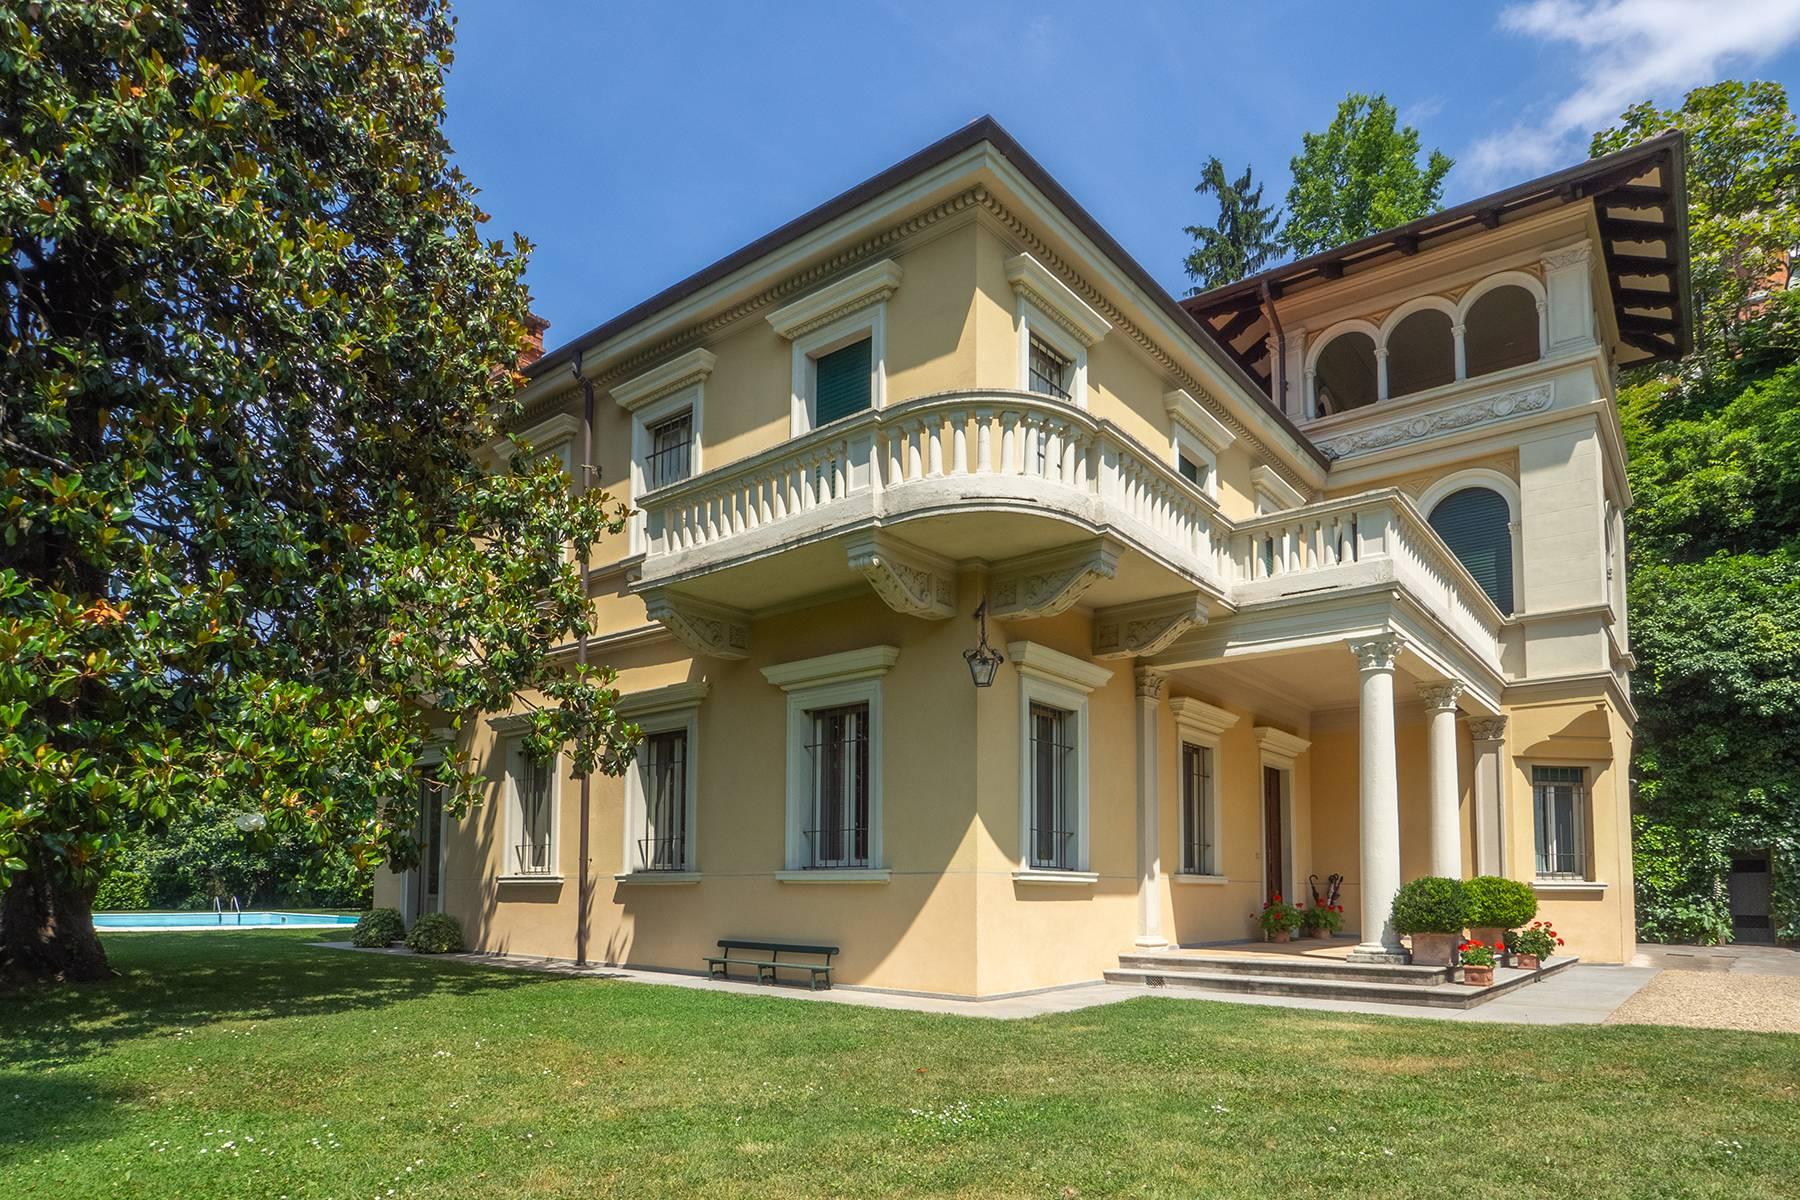 Casa indipendente in Vendita a Torino: 5 locali, 657 mq - Foto 5